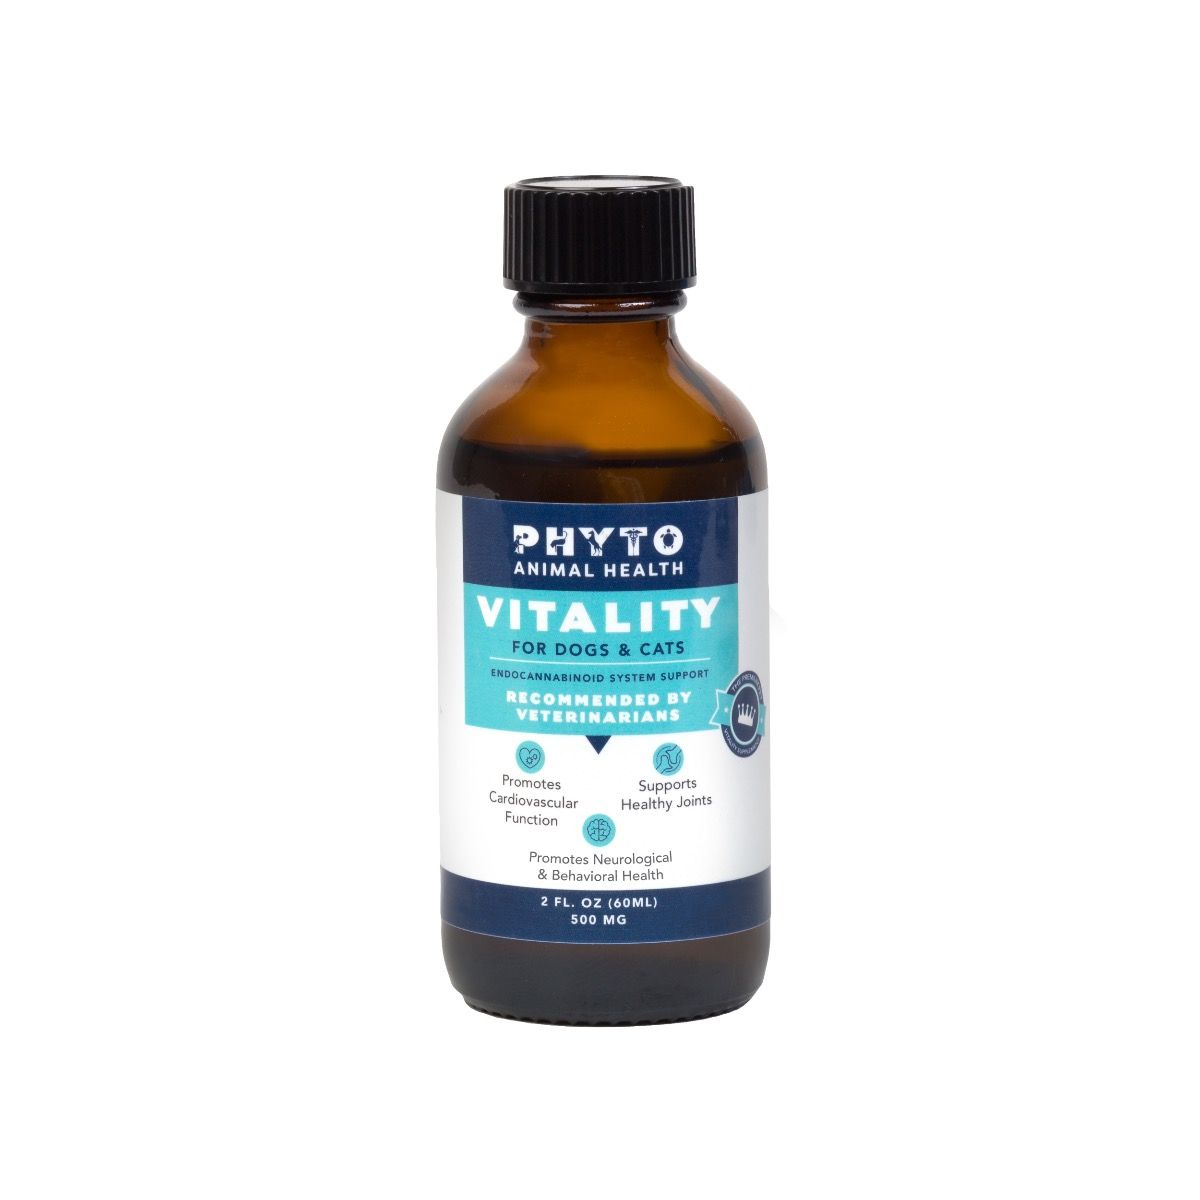 phyto-cbd-vitality-500mg-2oz-front